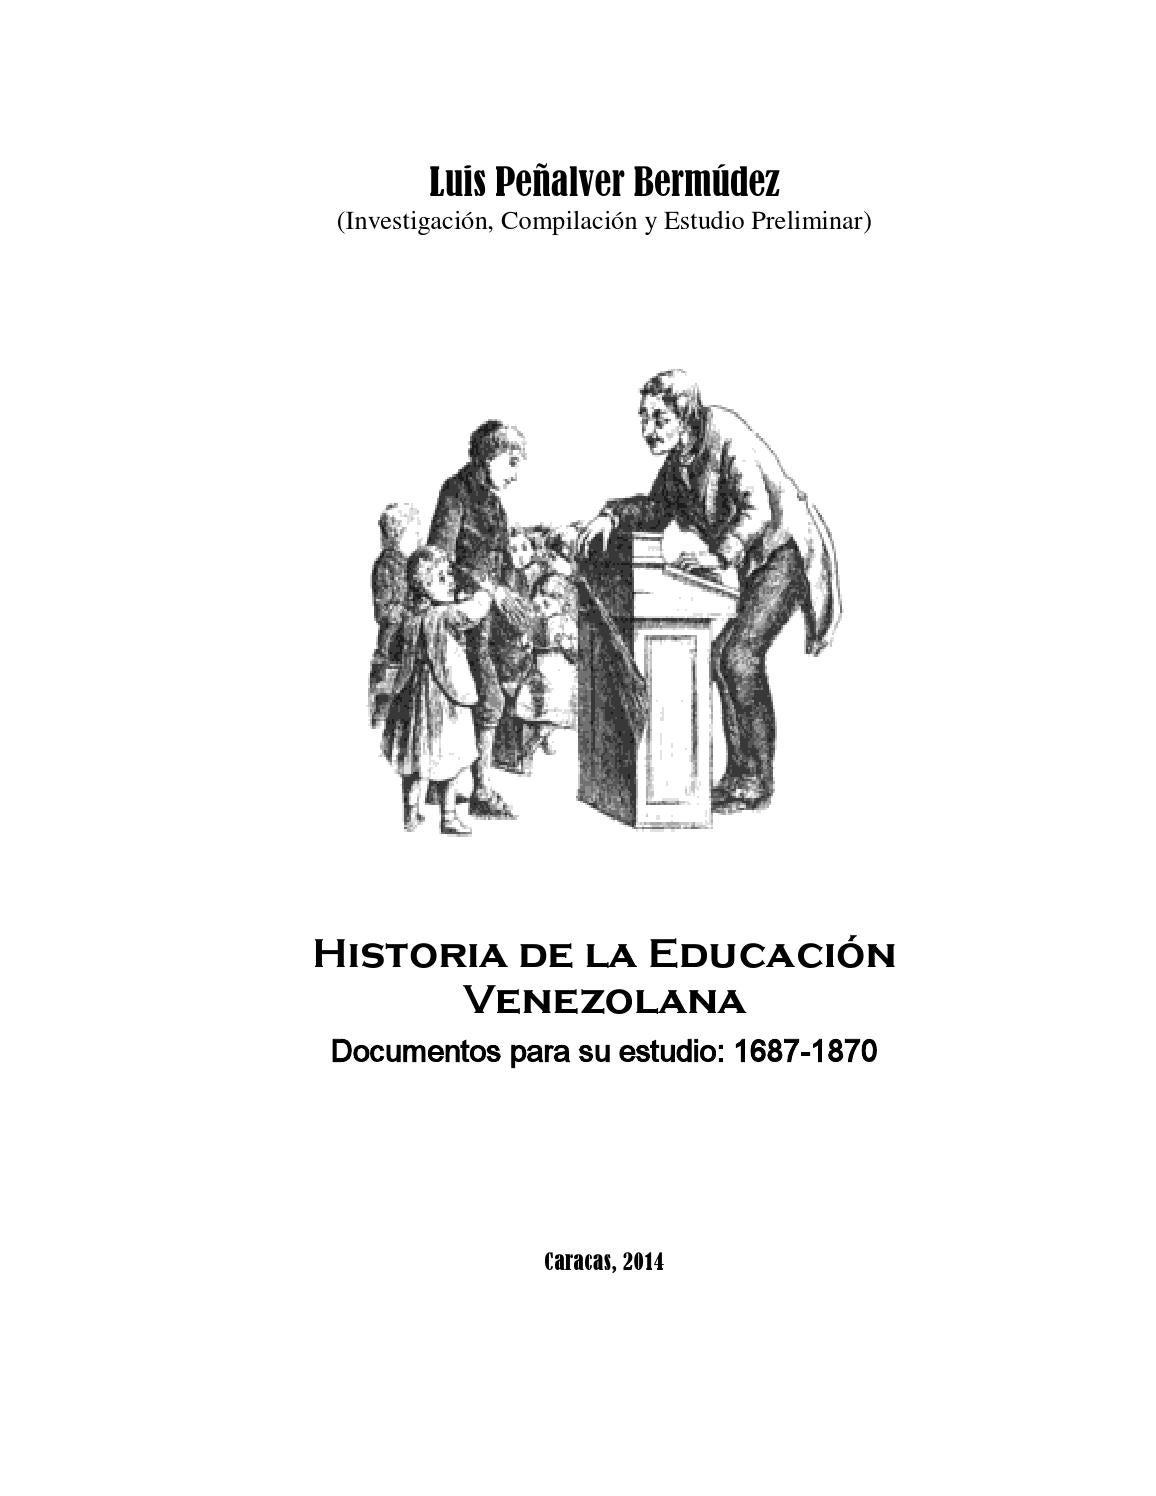 Historia de la educacion venezolana documentos 1687 1870 (junio 12 ...